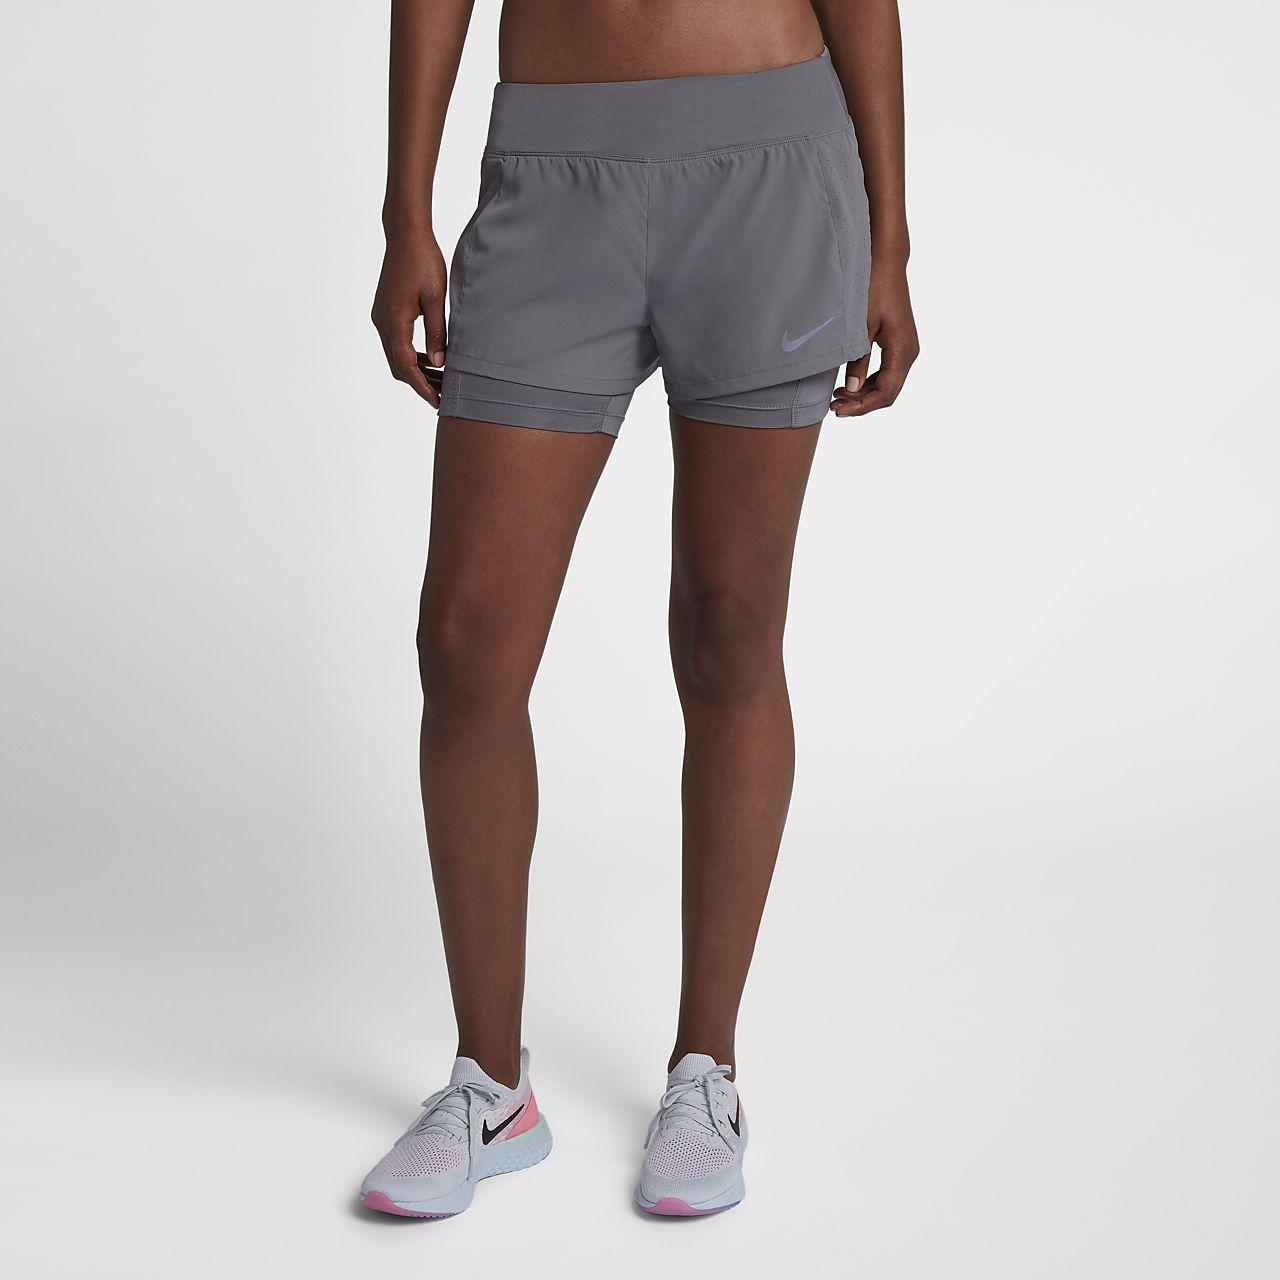 the best attitude 9379d 5e842 ... Nike Eclipse 2-in-1-Laufshorts für Damen